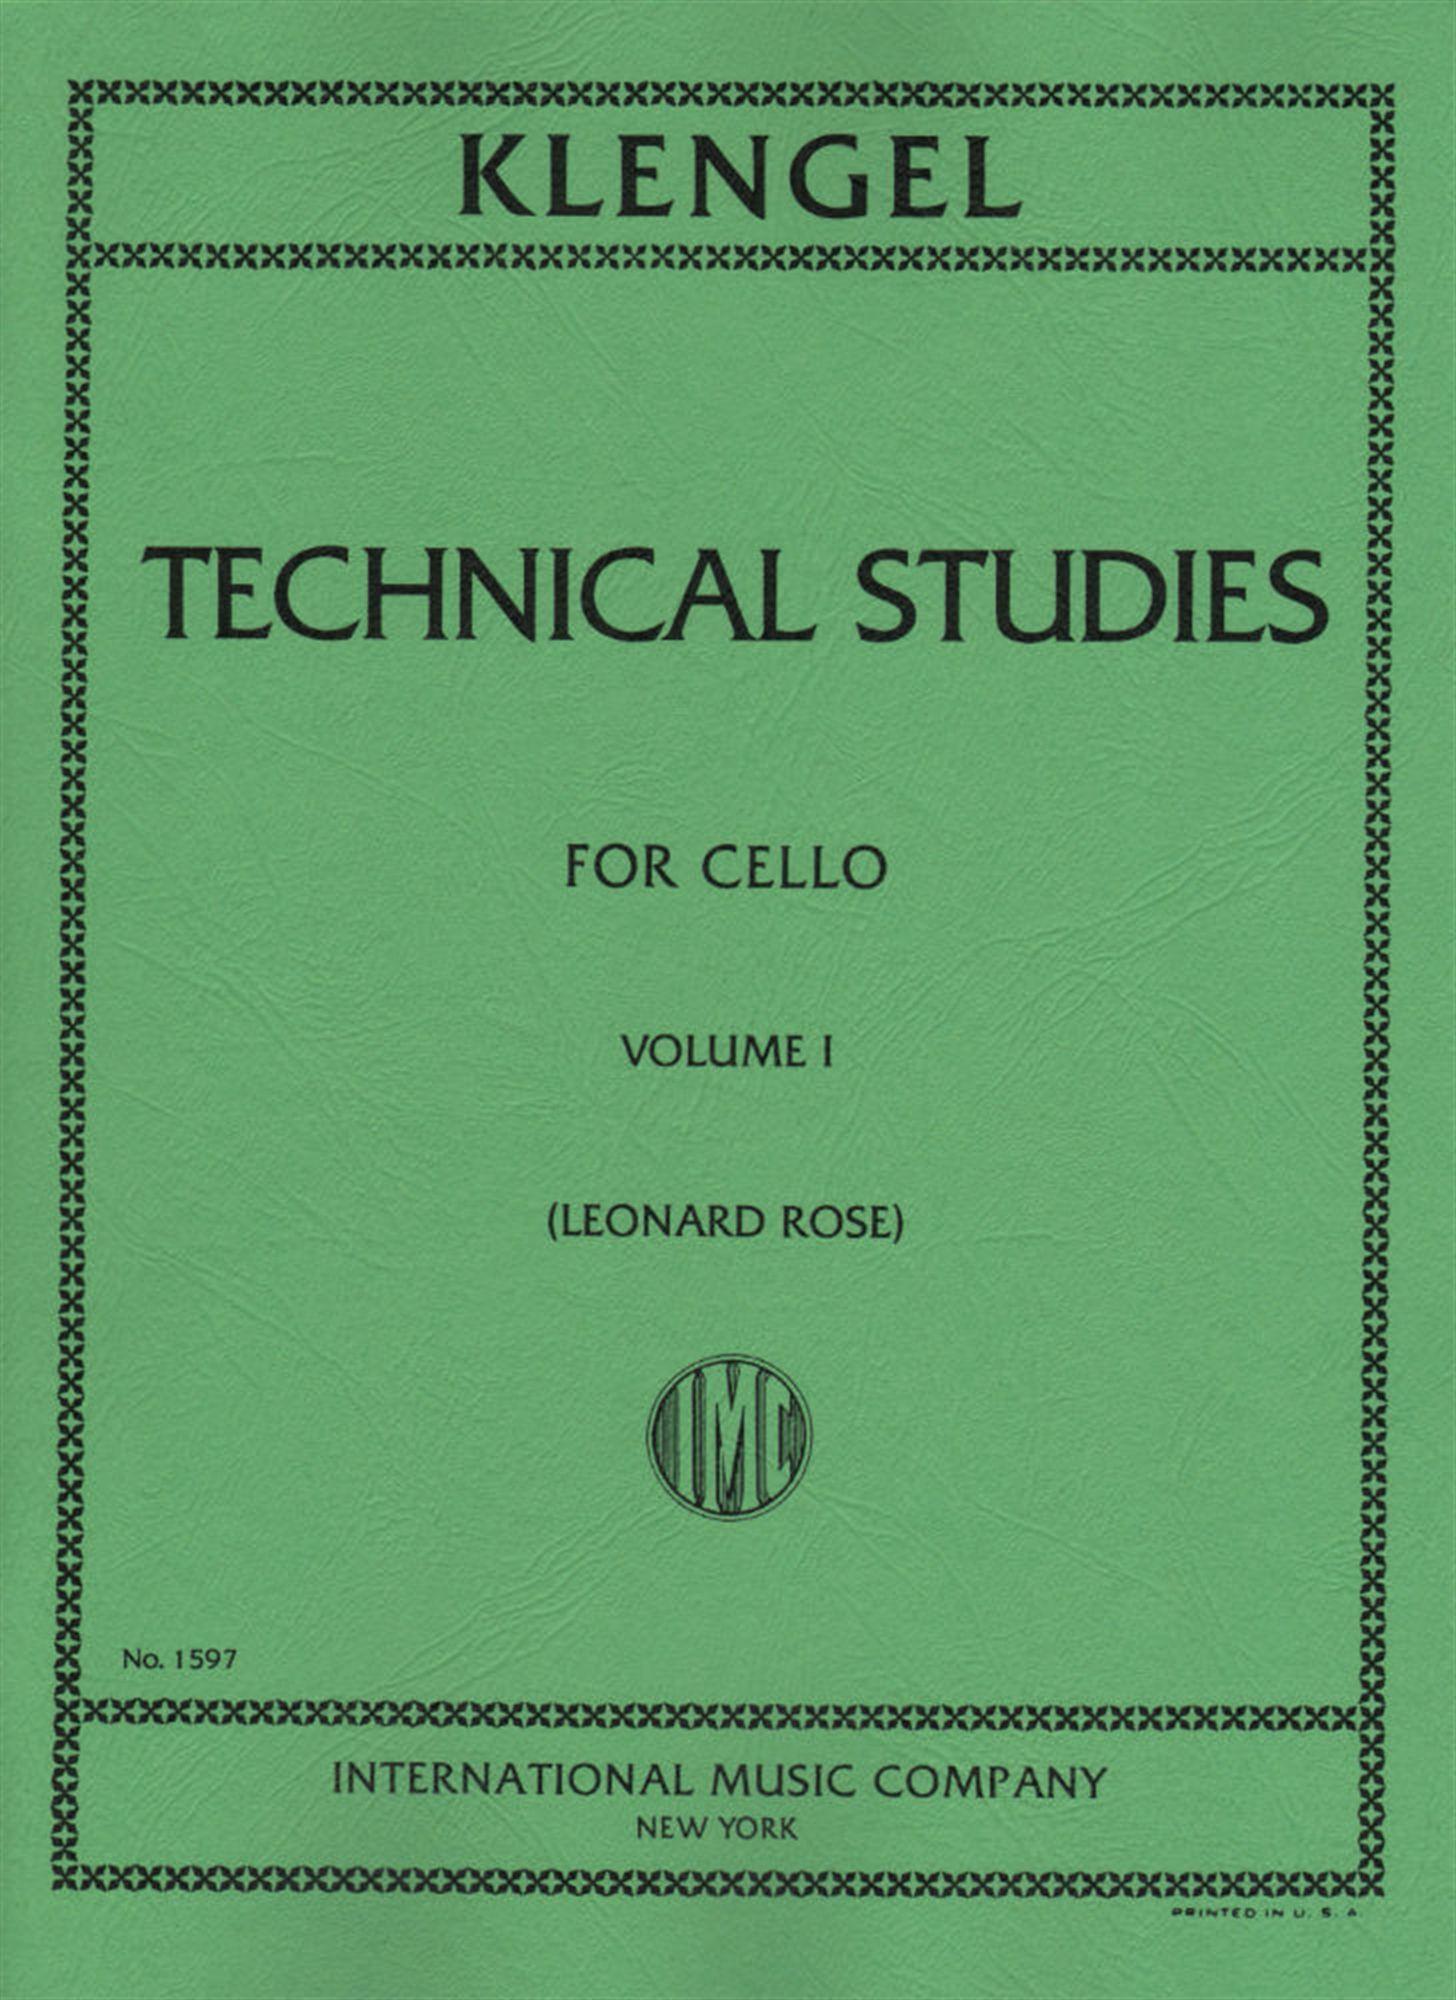 Klengel, Julius - Technical Studies, Volume 1 - Cello solo